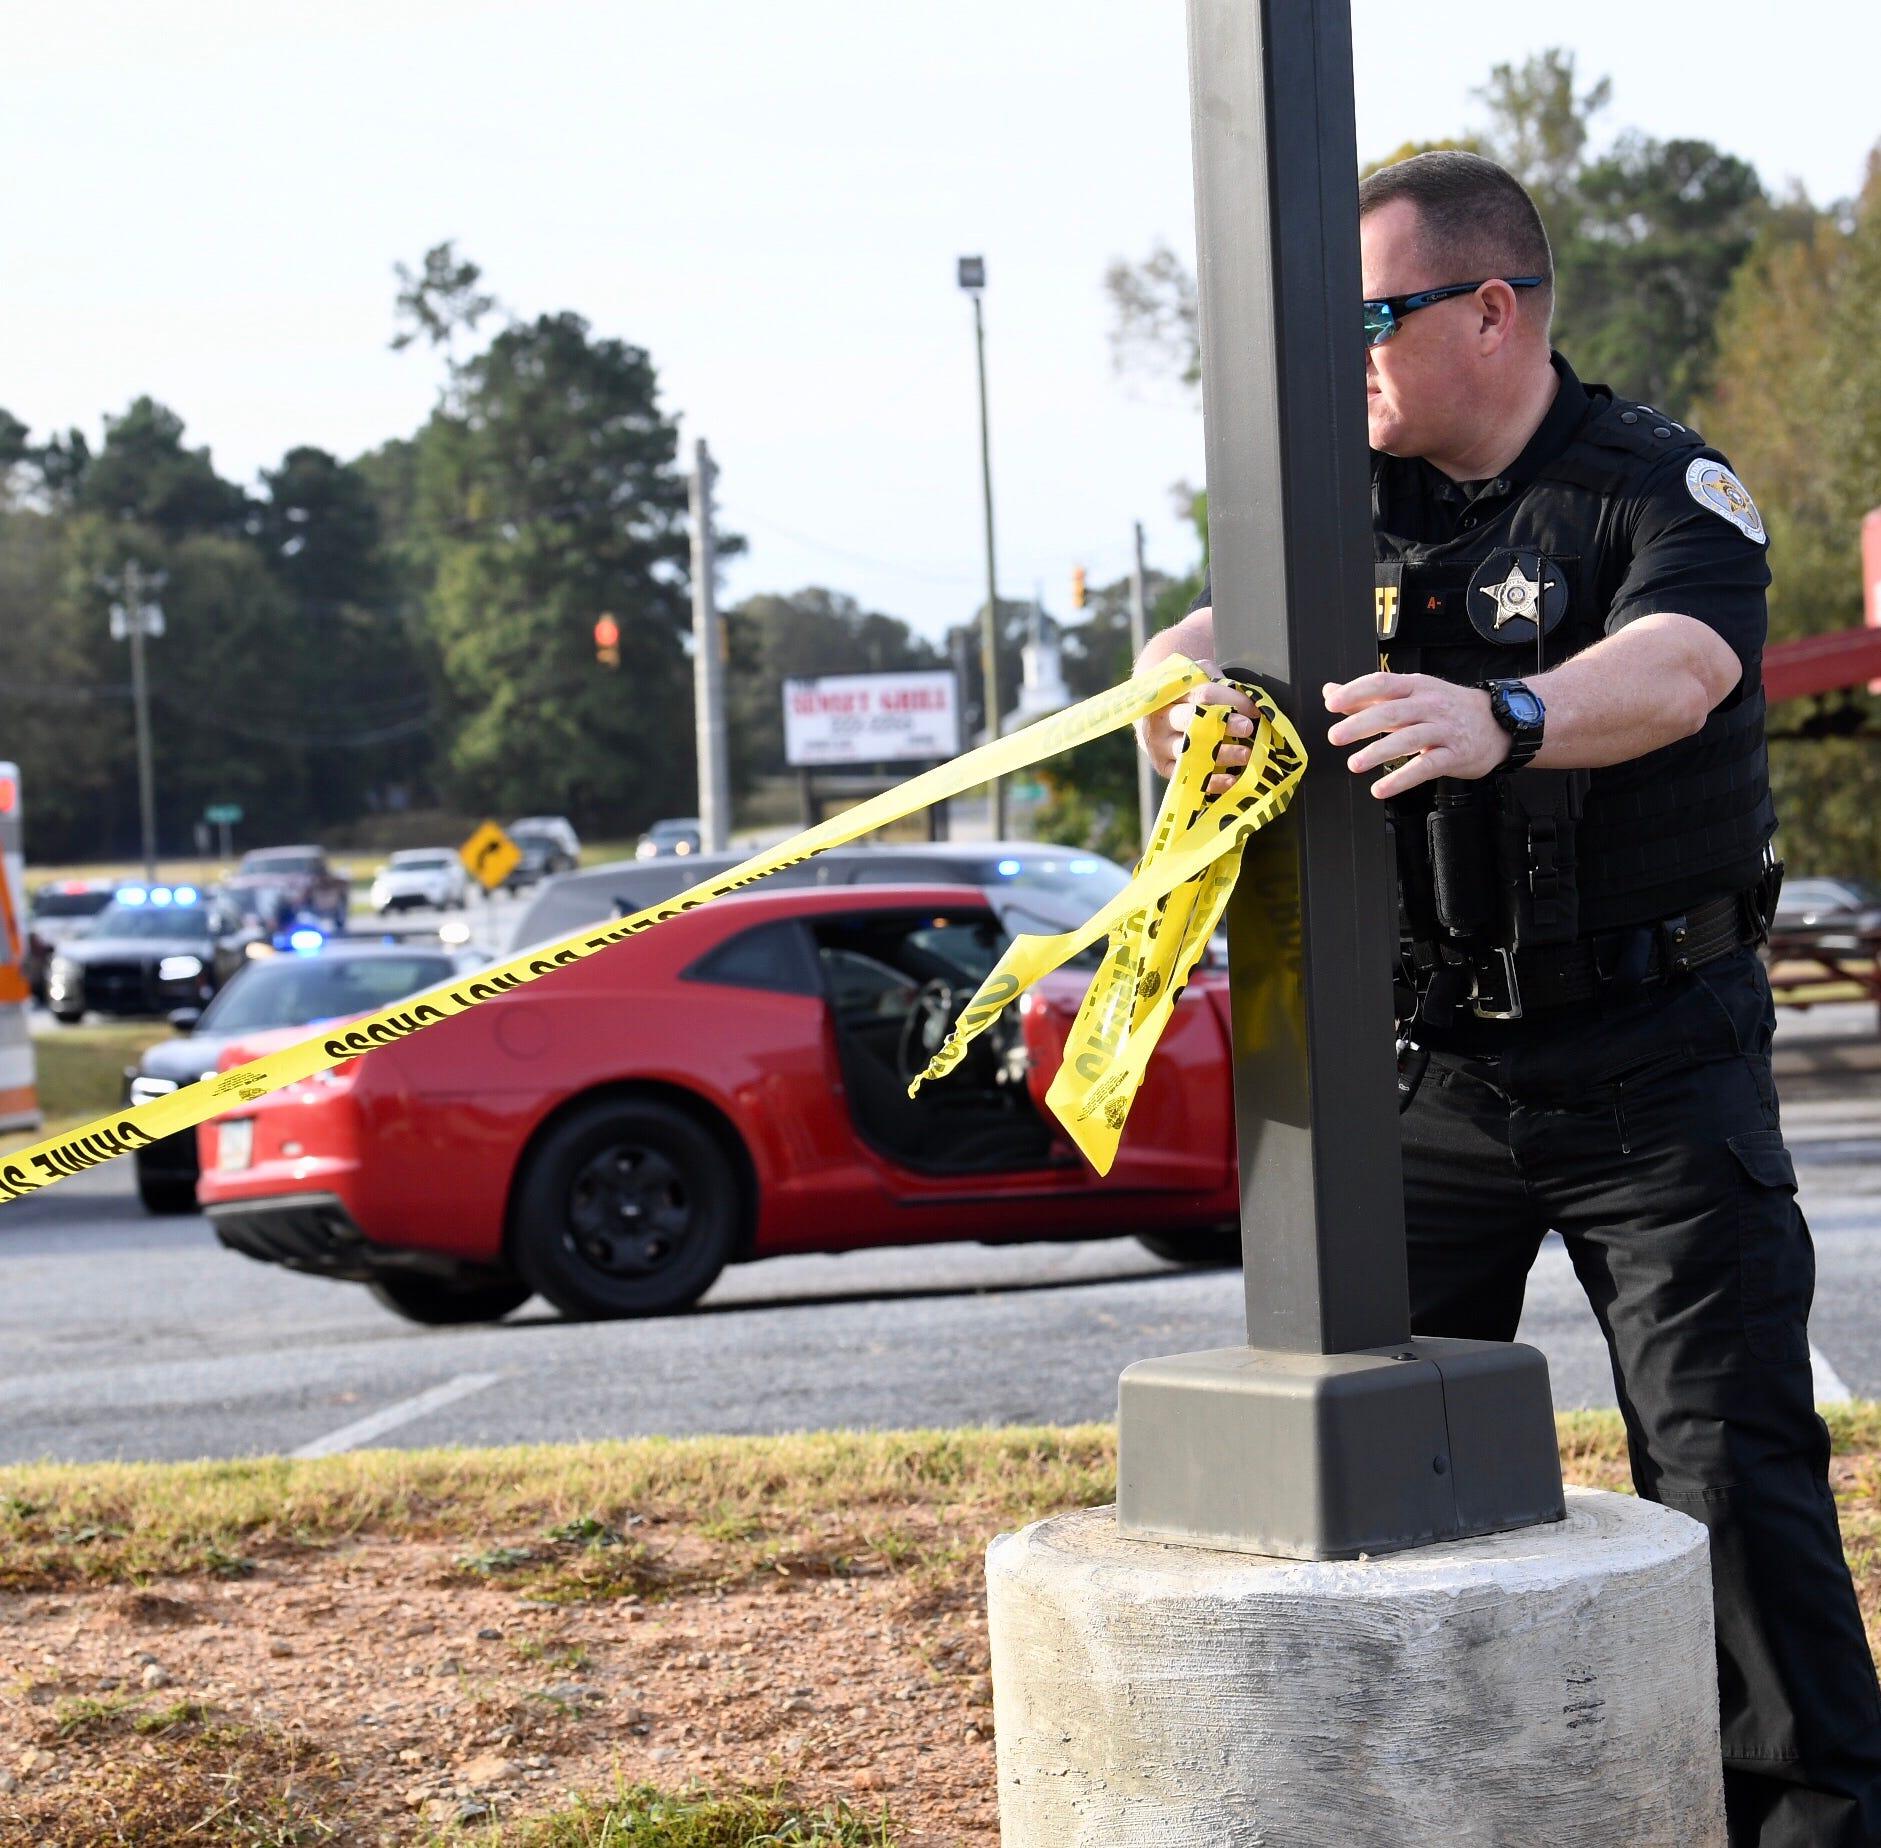 Coroner identifies man killed in shooting near Anderson restaurant